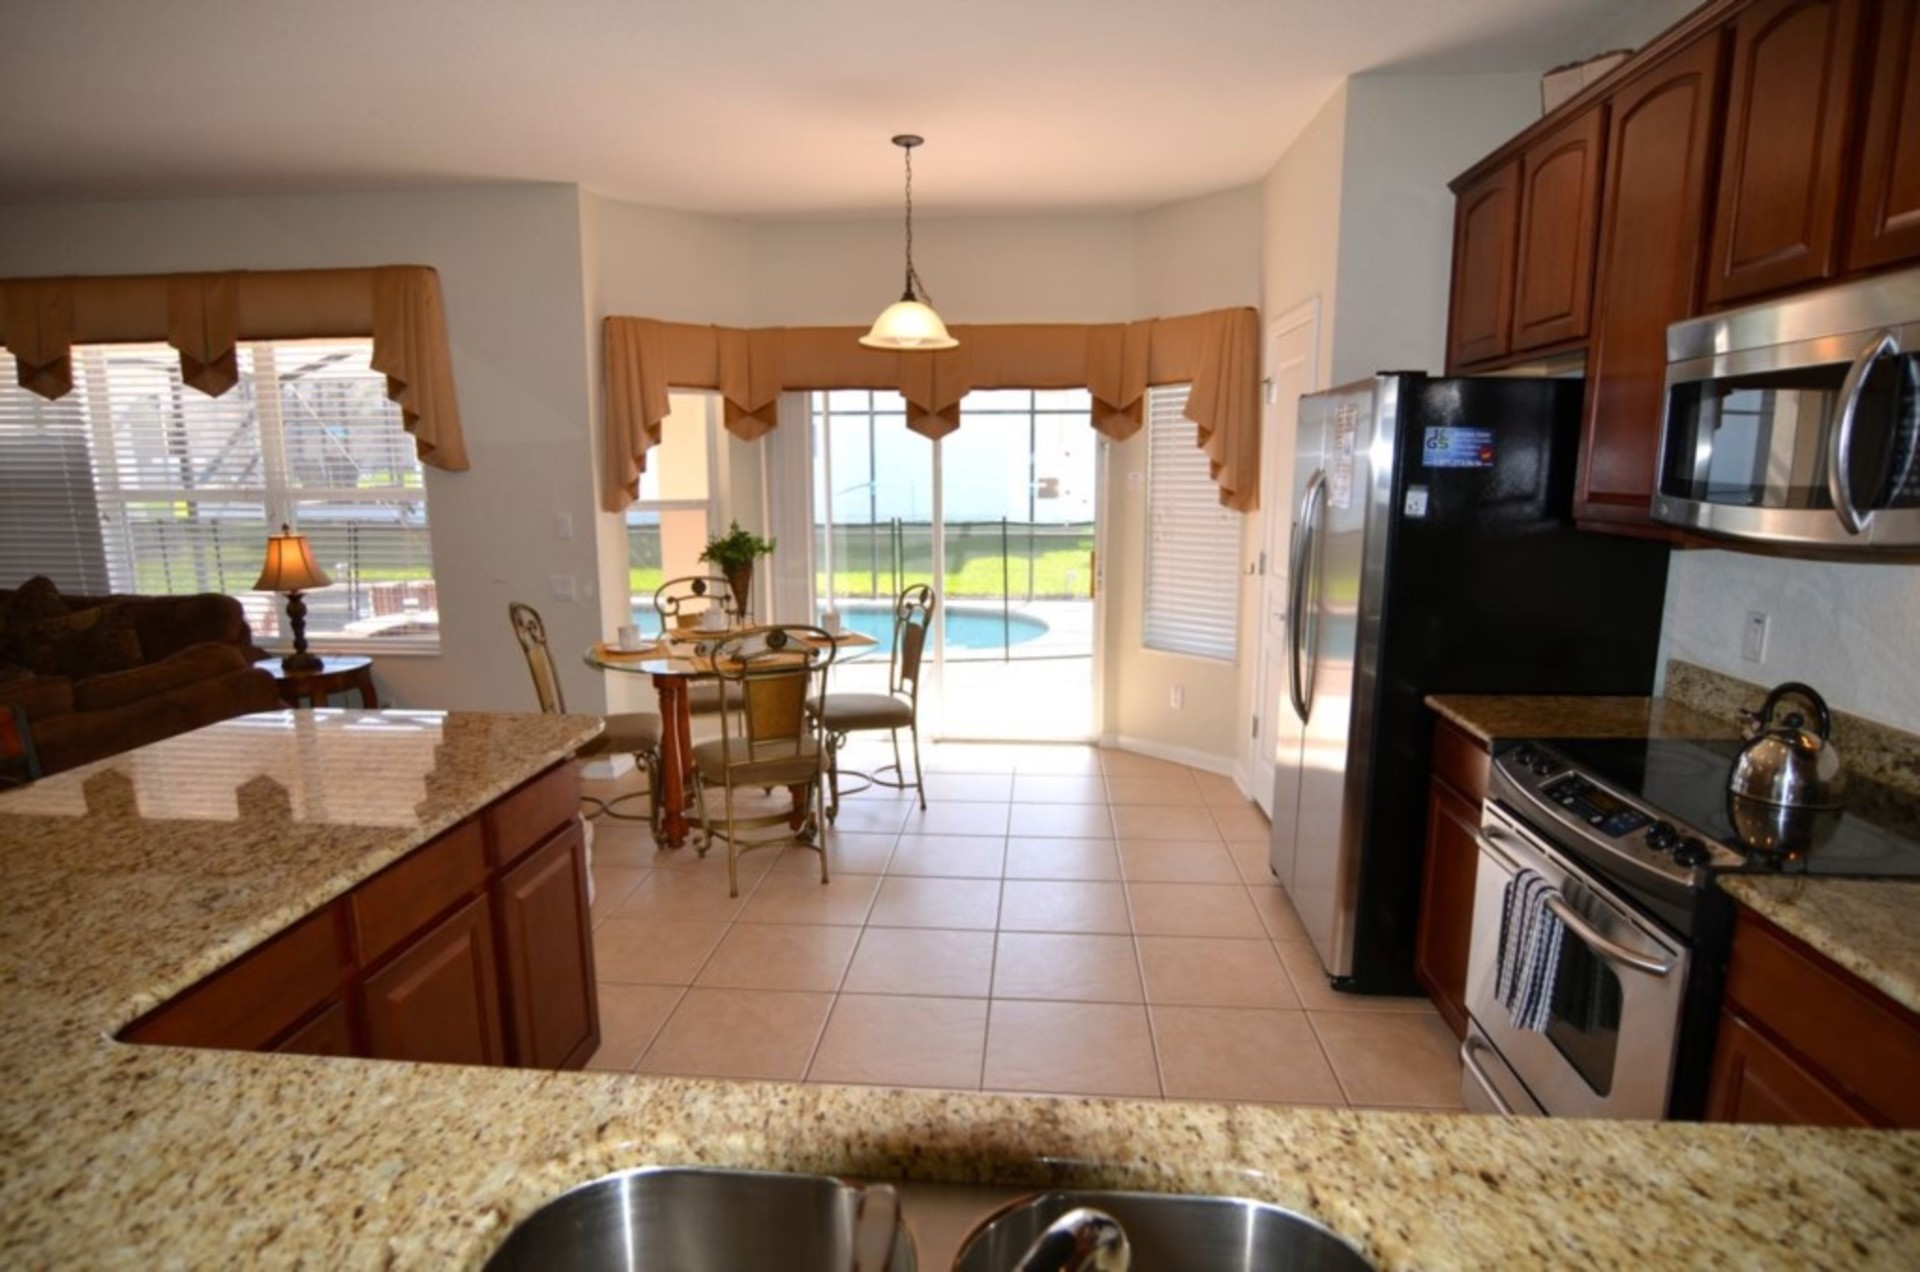 Enjoy a 5 Star Villa Holiday with your Family, Windsor Hills Resort, Villa Orlando 1459 photo 5803830